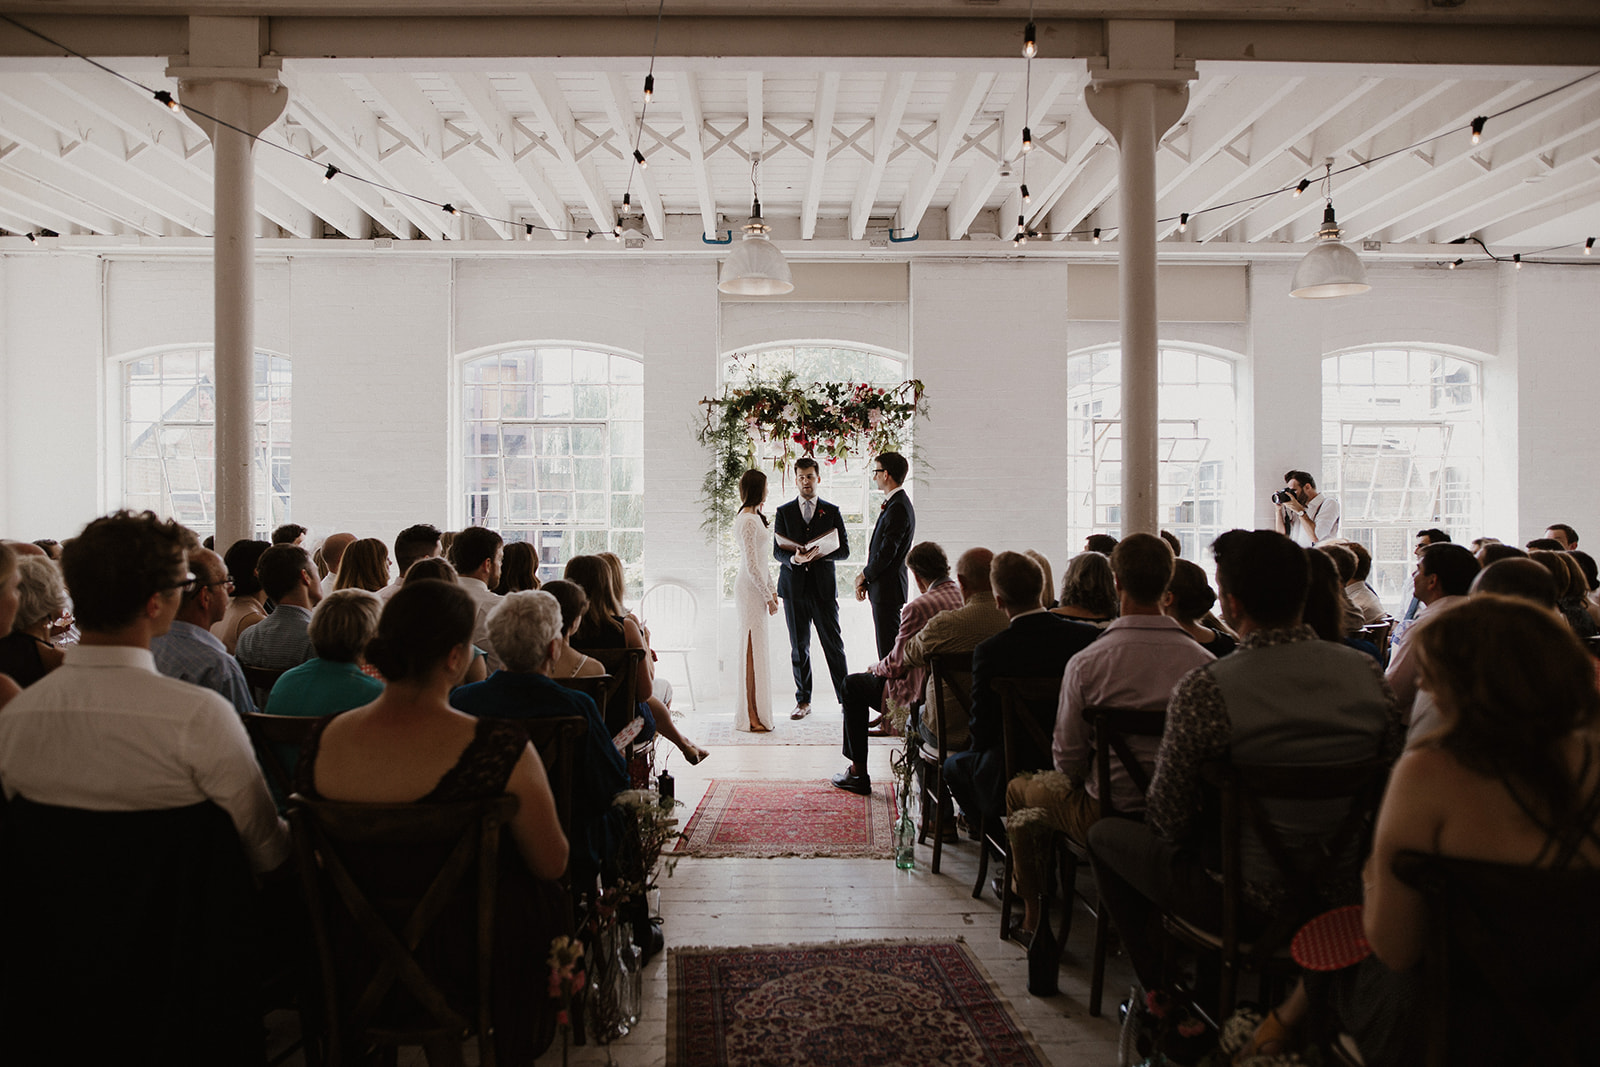 Adam and Emily - 04 - Ceremony - Sara Lincoln Photography-88.jpg